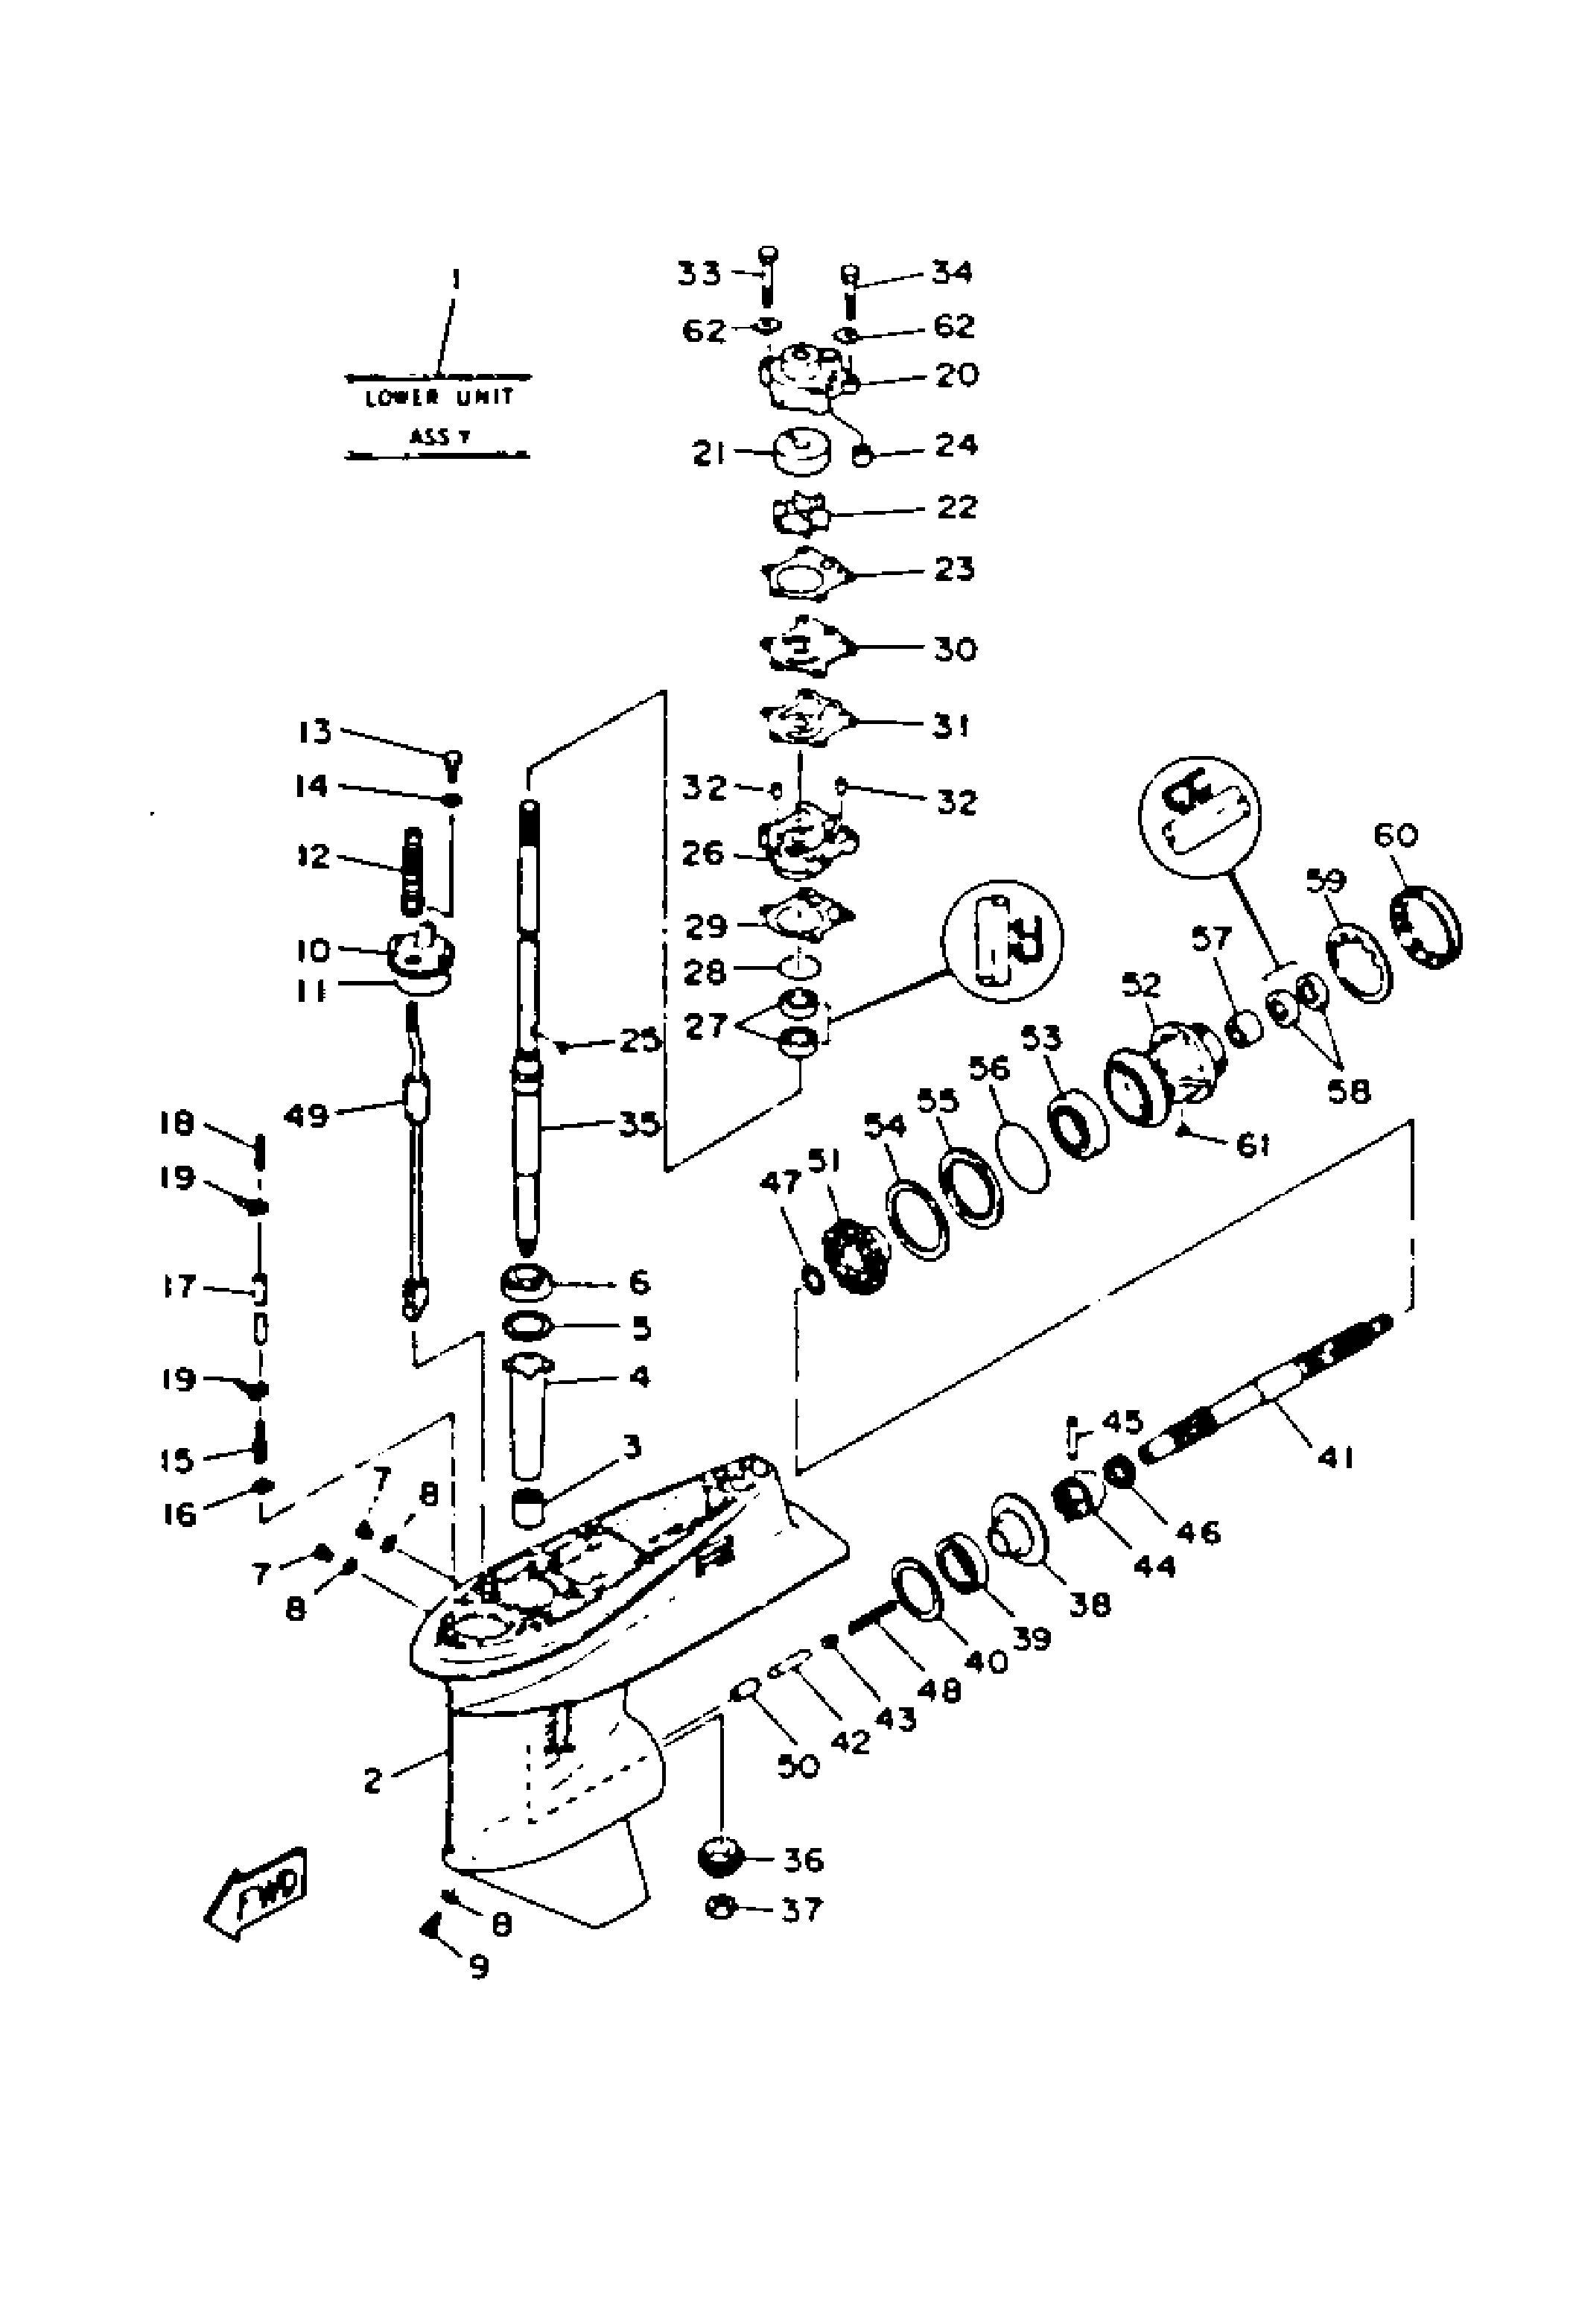 Sa 3922 Motor Wiring Diagram On 90 Hp Mercury Ignition Switch Wiring Diagram